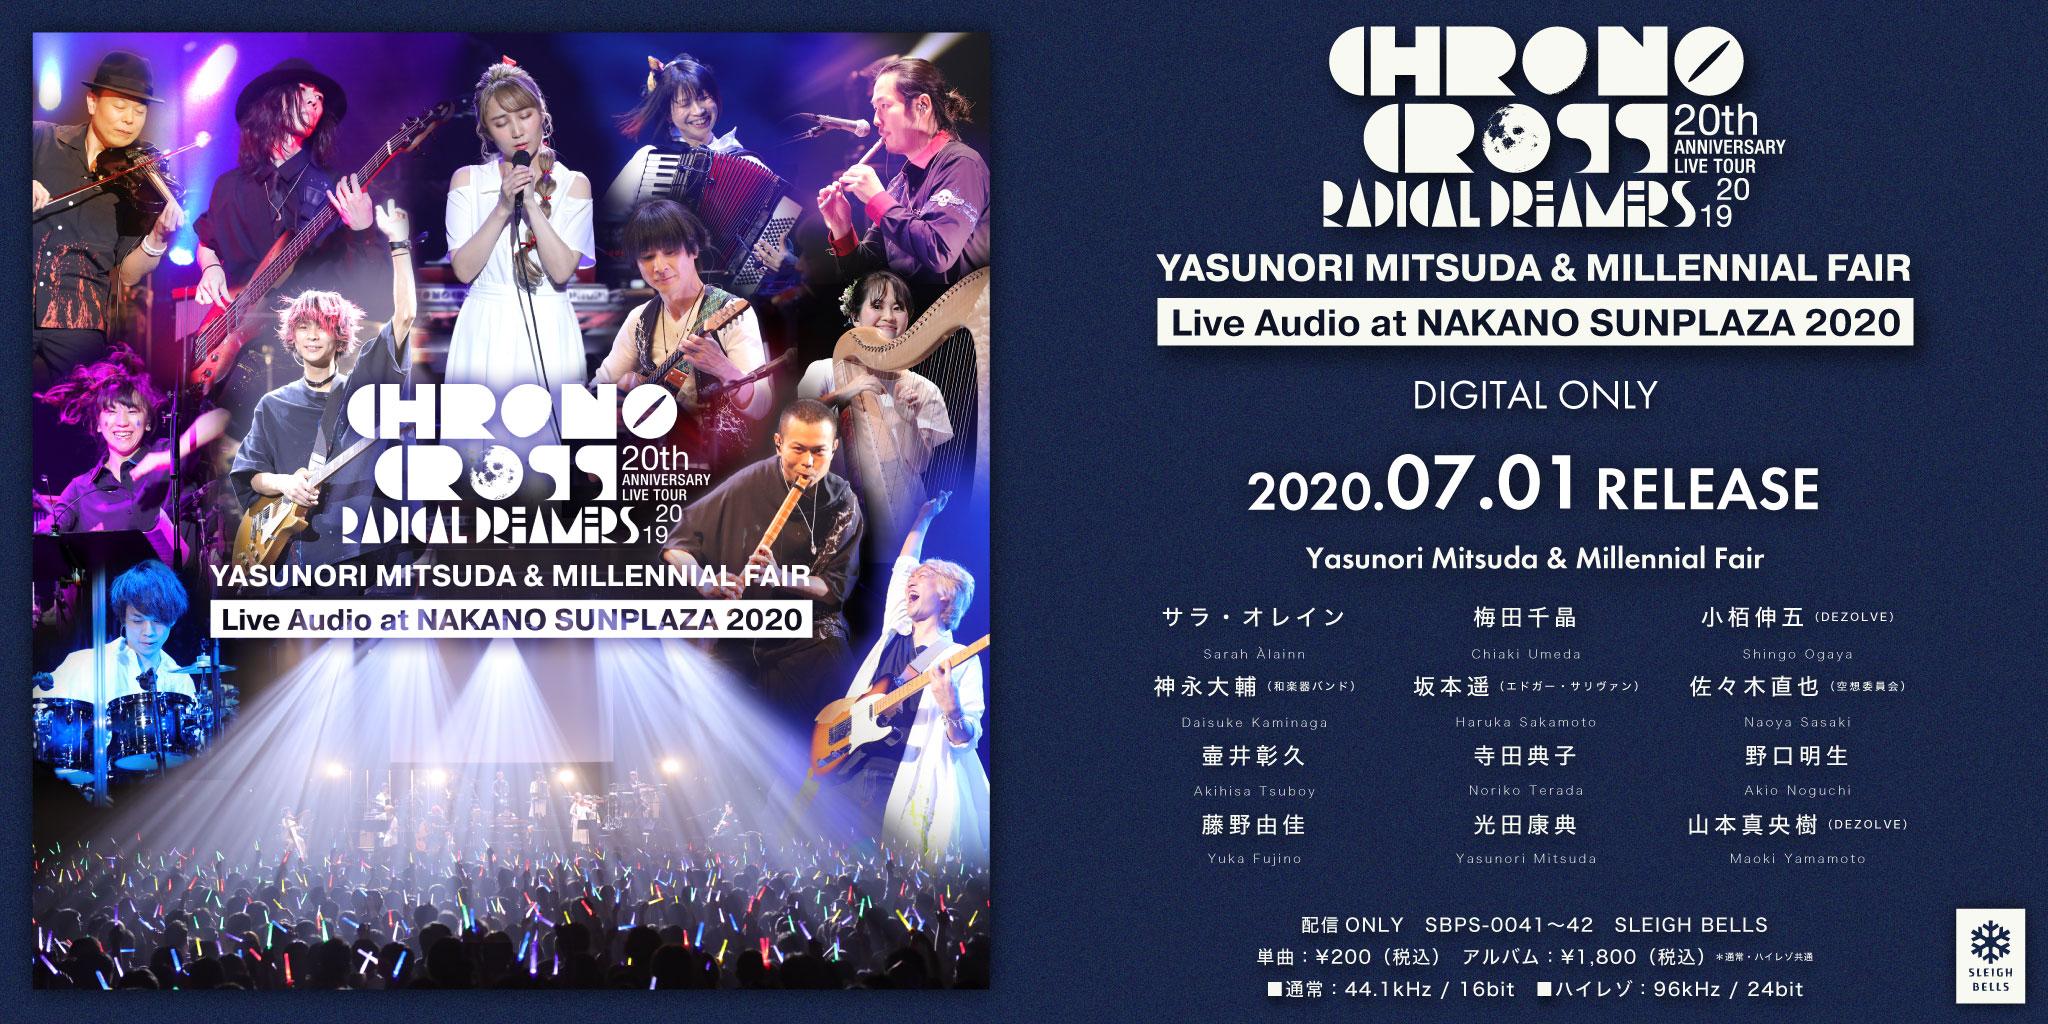 CHRONO CROSS Live Audio